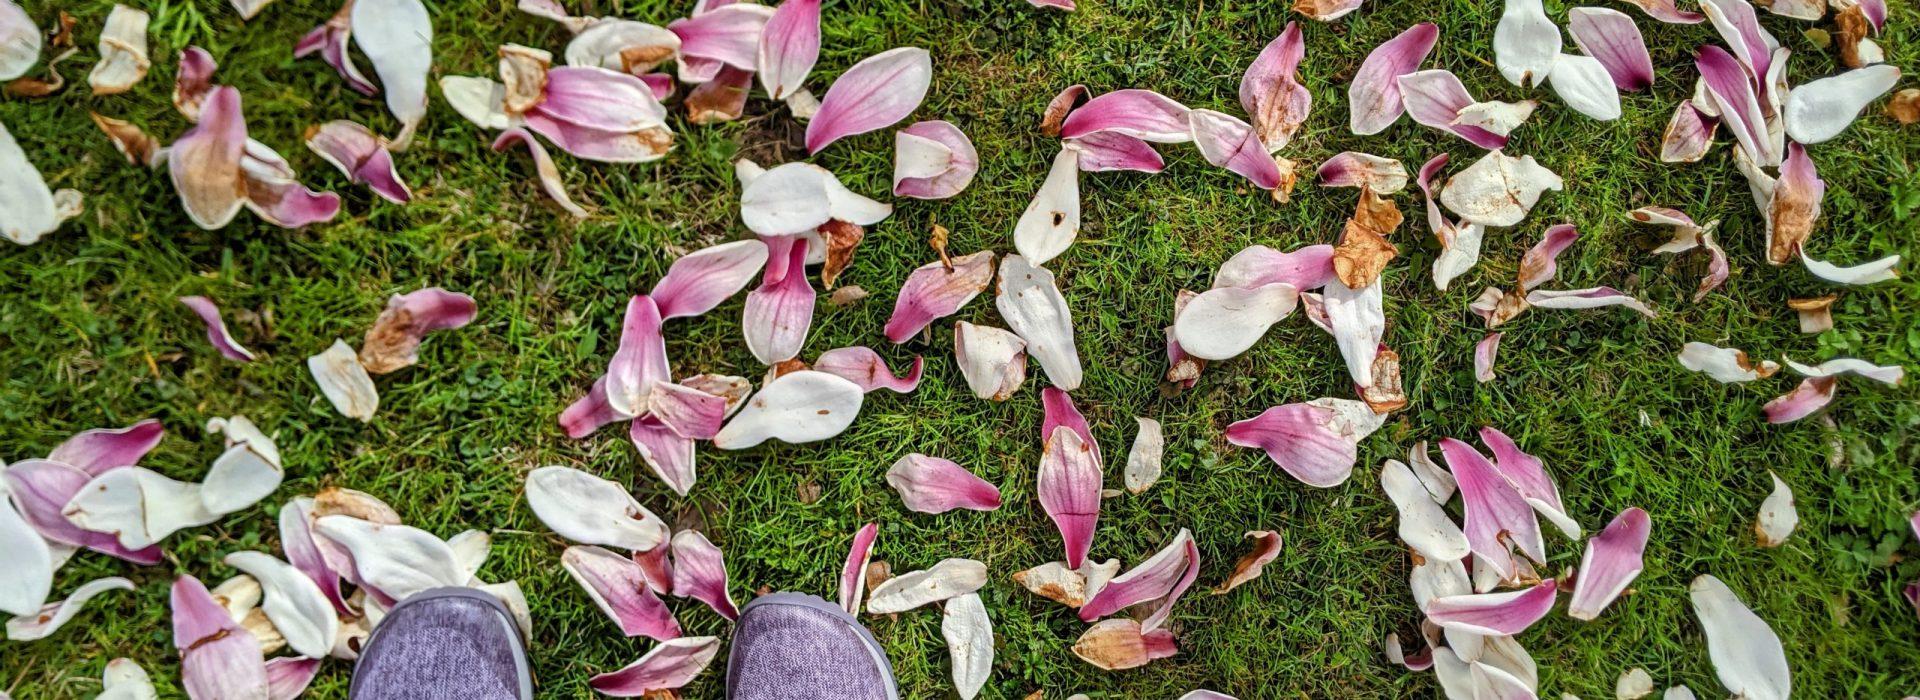 Graveyard Walking, Magnolia lilliflora petals, Chippiannock Cemetary